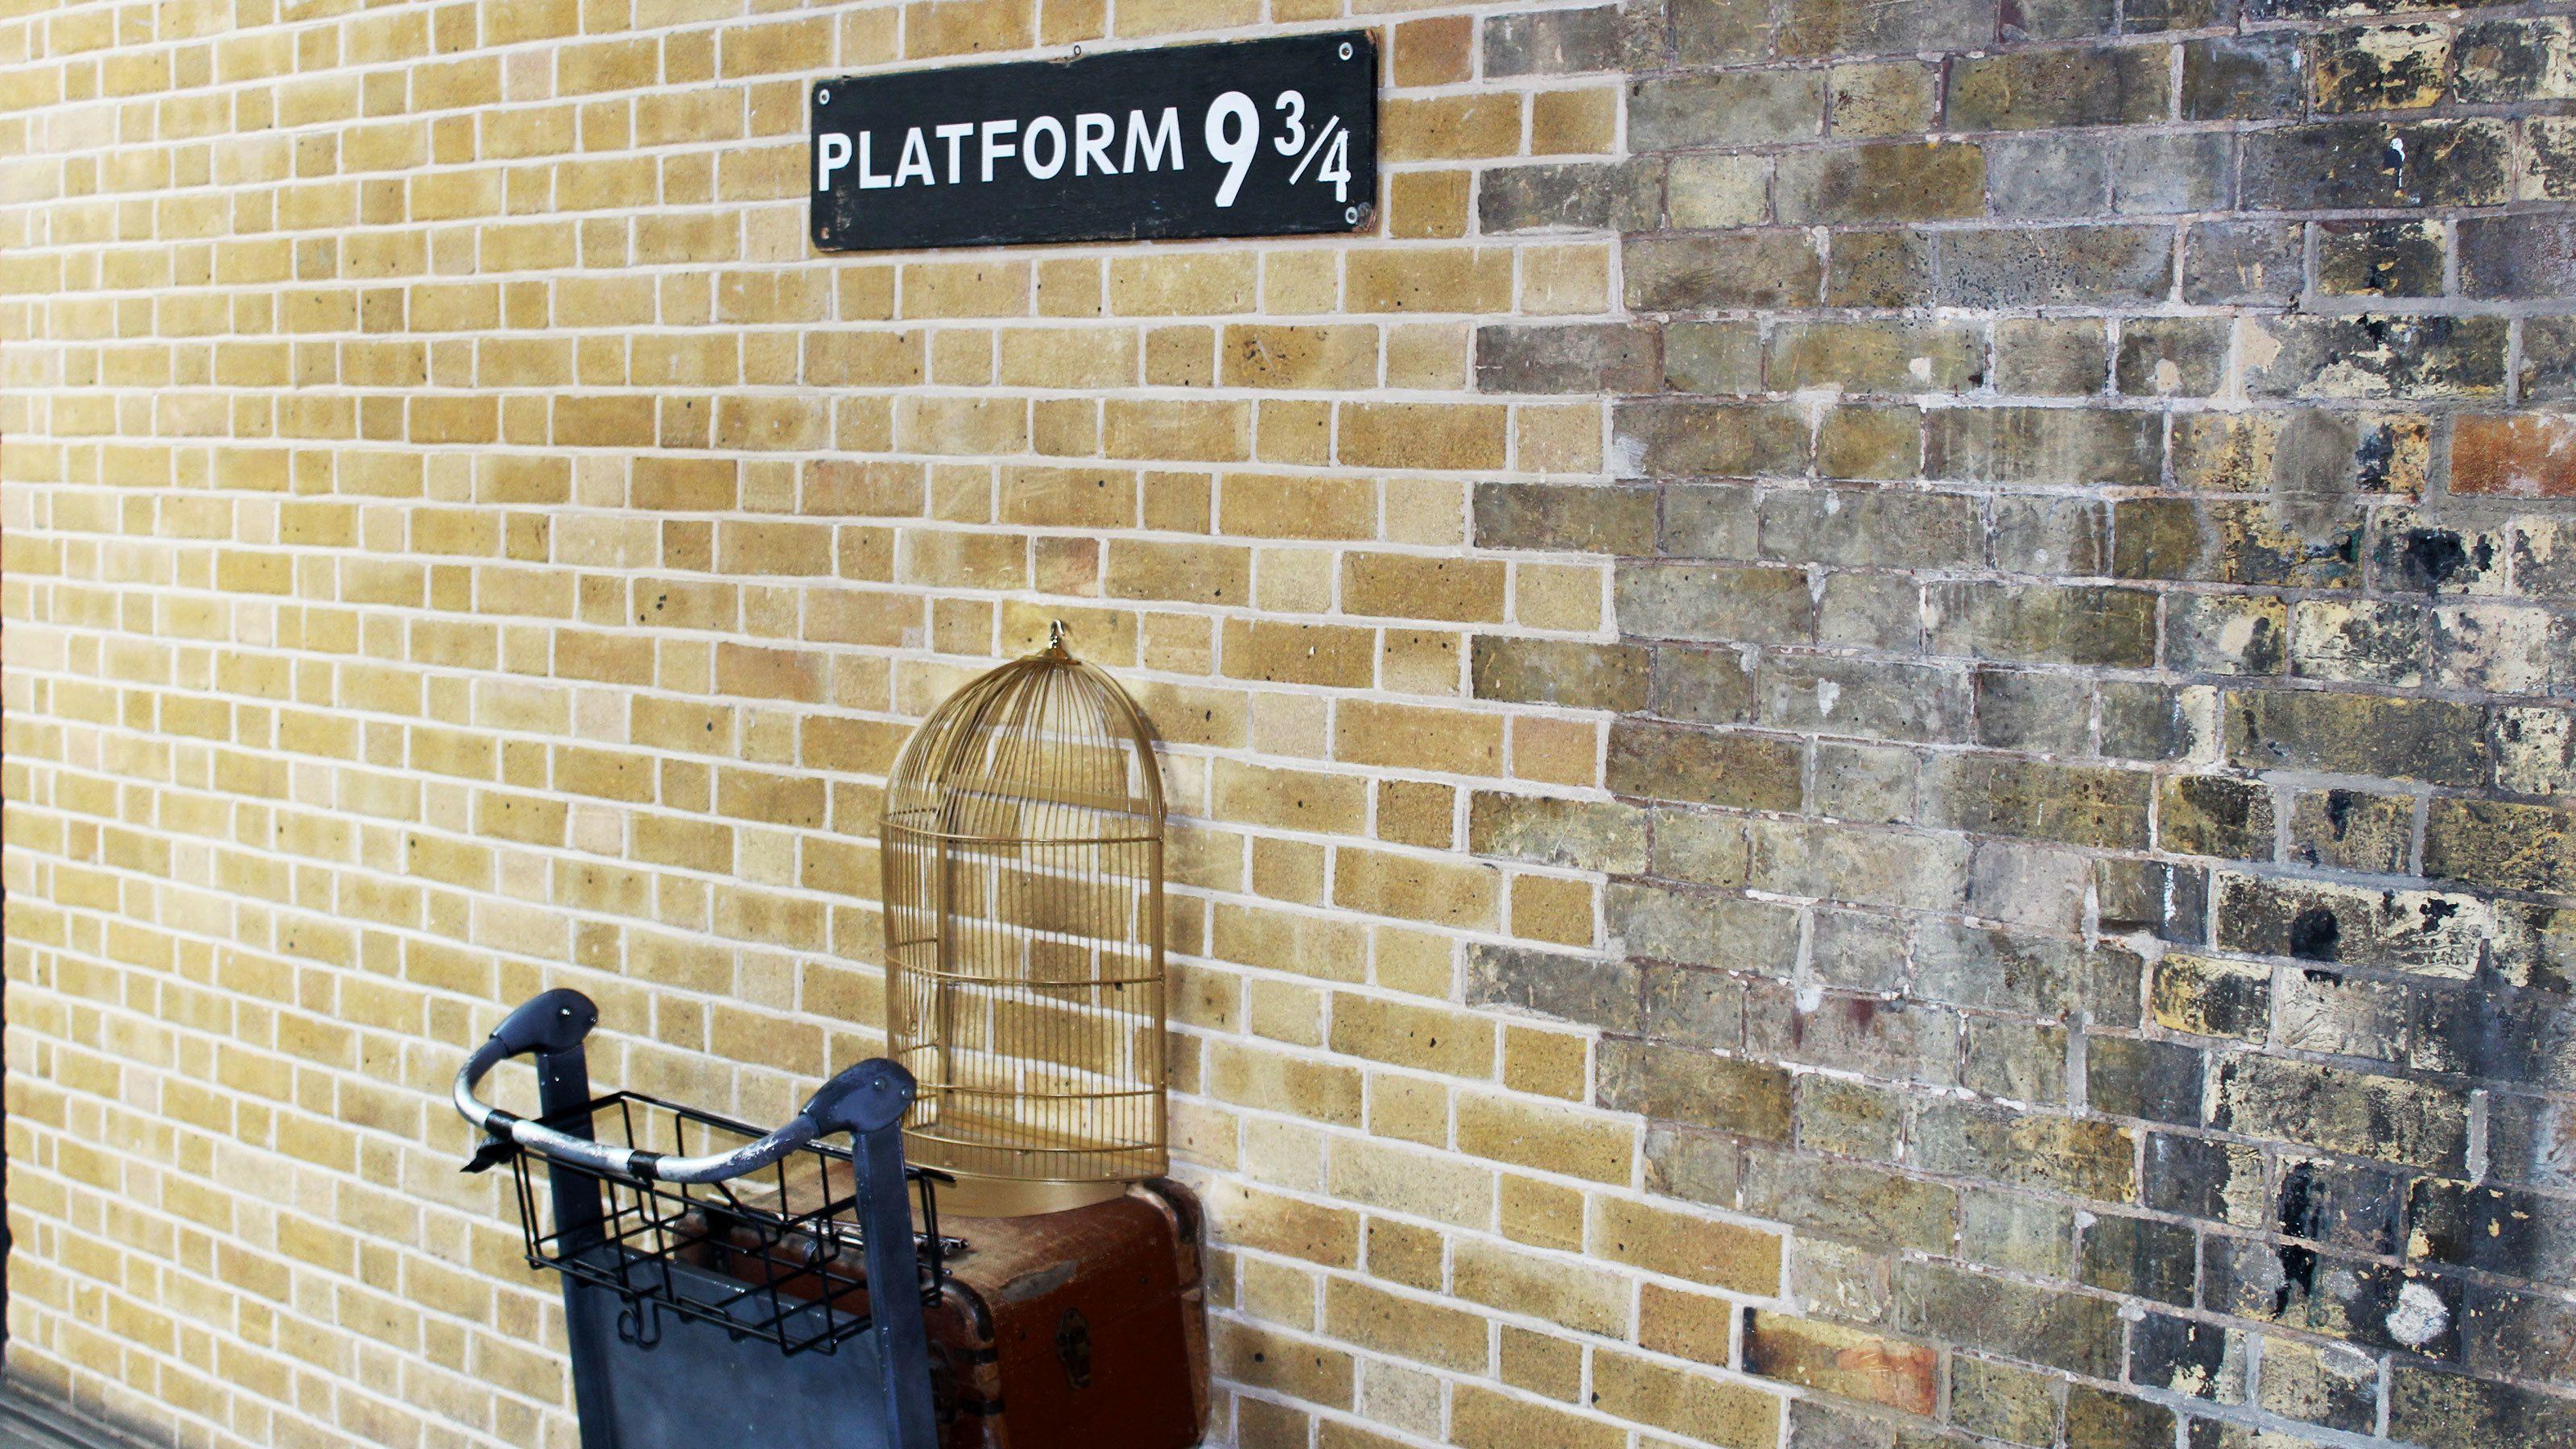 Cart halfway through wall at Platform 9 3/4 in London